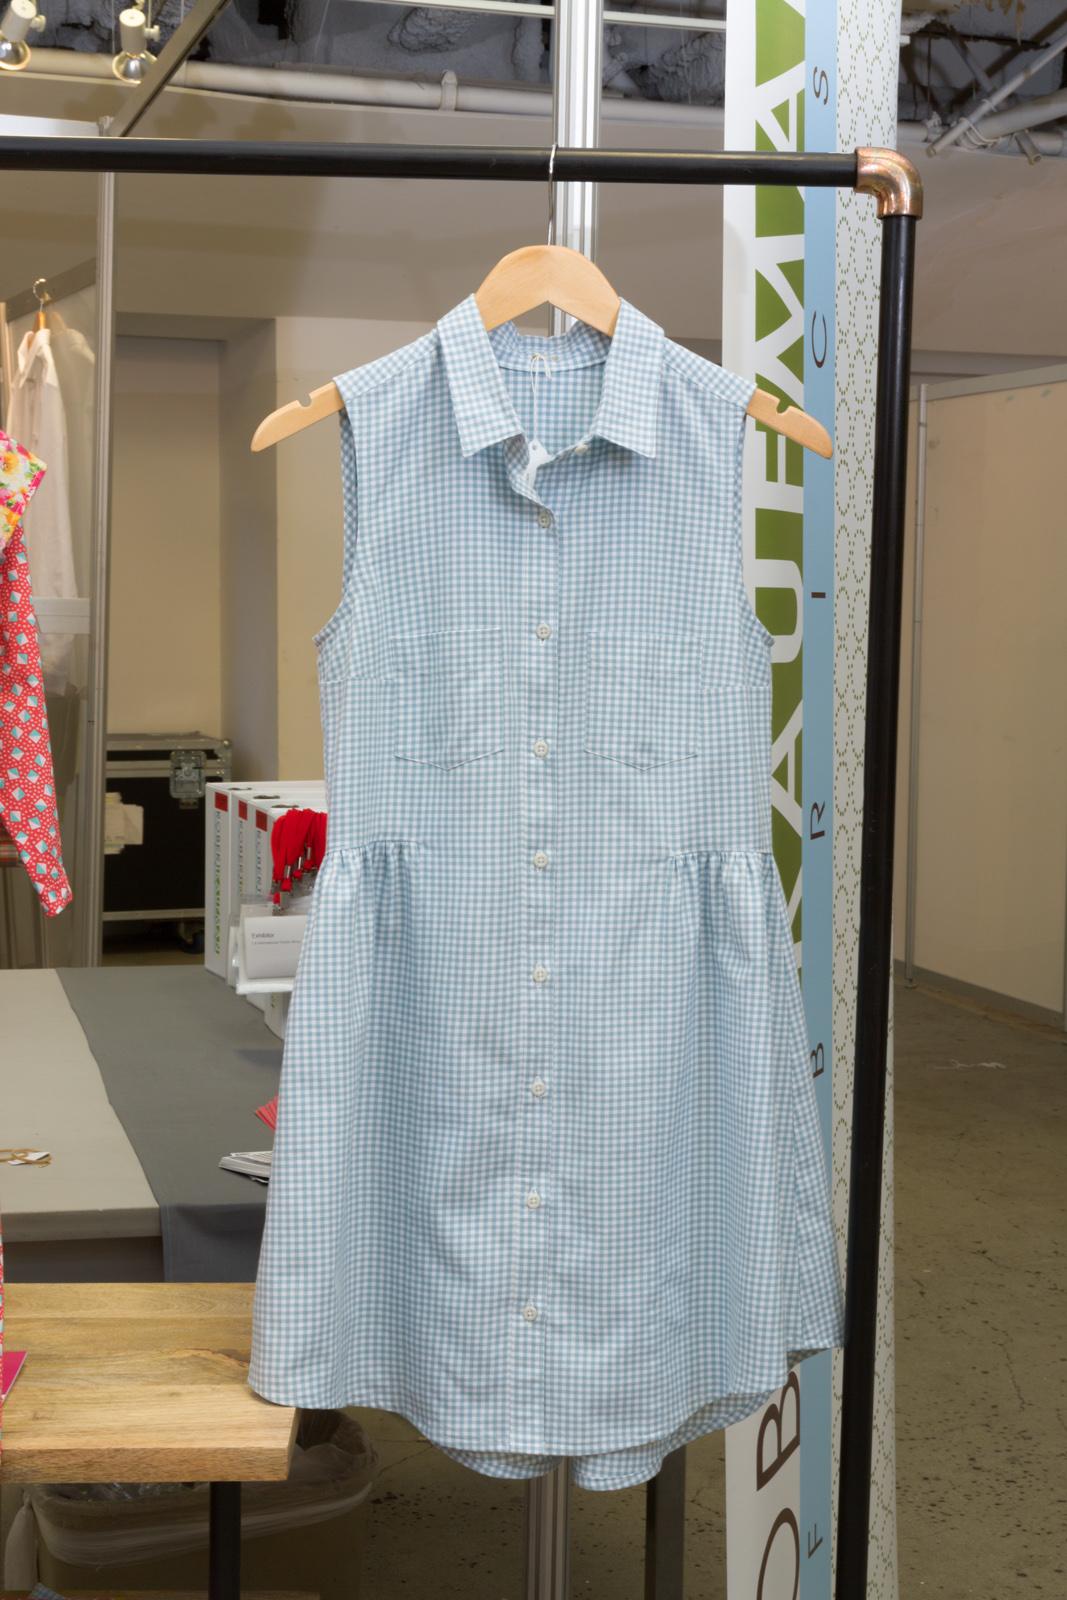 Alder Shirtdress   by   Grainline Studio,   made by   Elinor Nissley  , featuring   Carolina Gingham